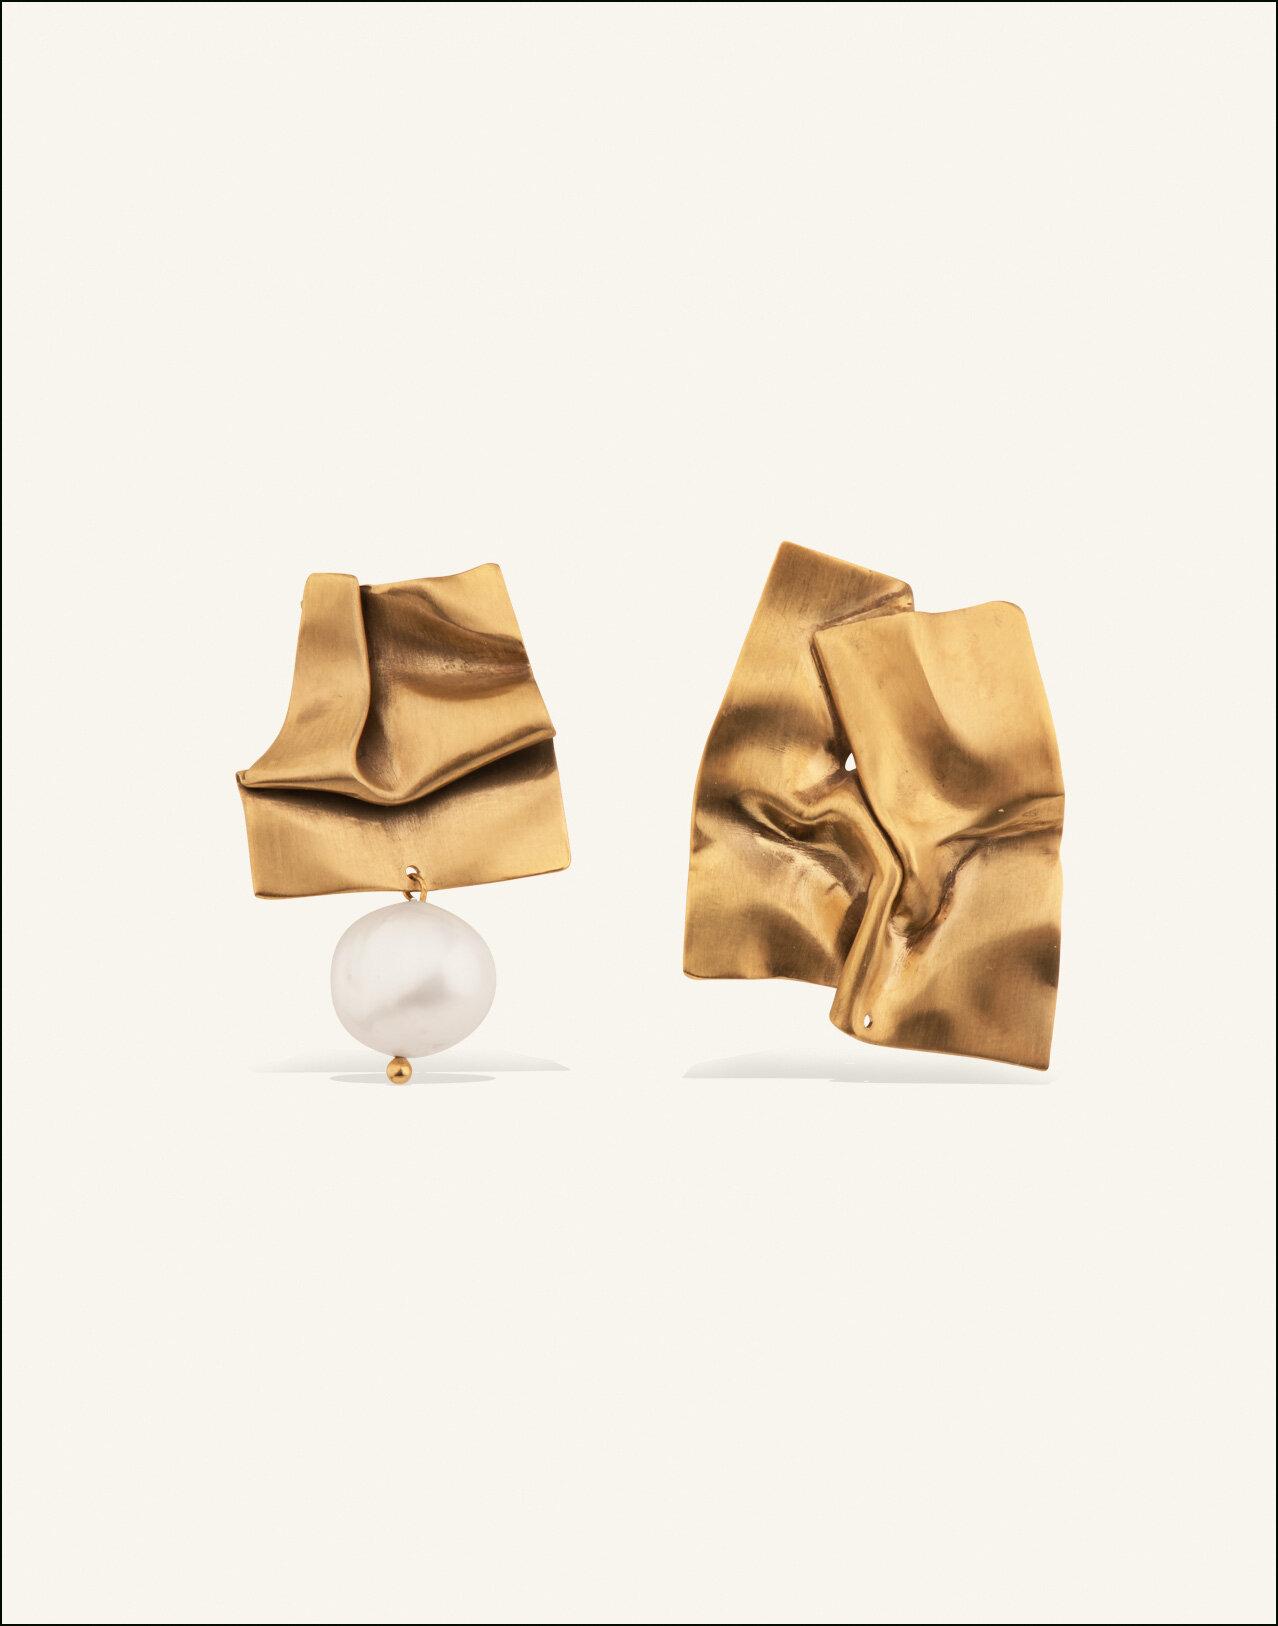 Completedworks-Gold-Vermeil-Earrings-Cohesion-1.jpg